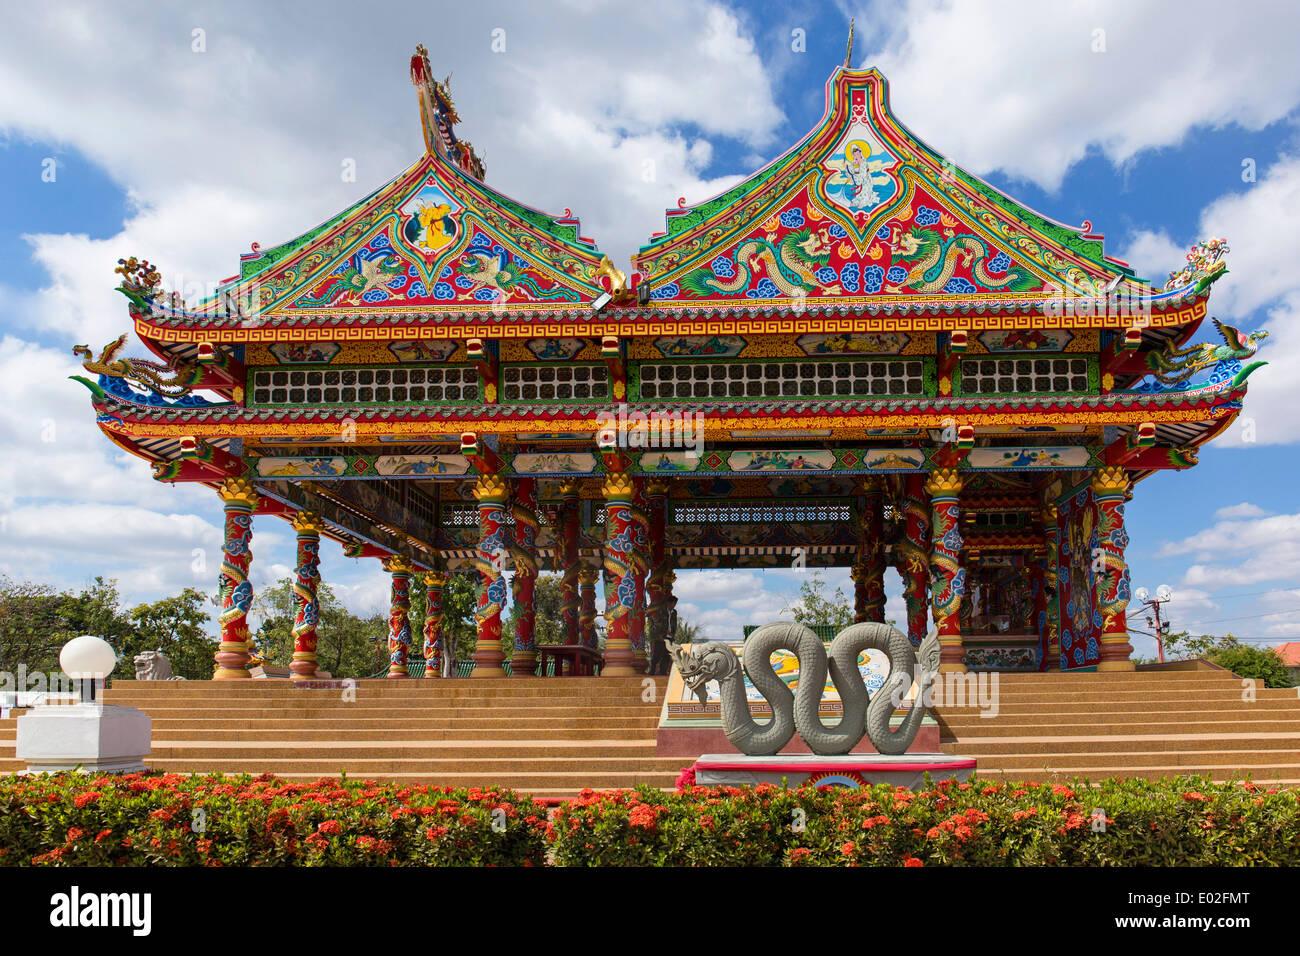 Chinese Chao Pu-Ya Shrine, Thung Sri Muang Park, Udon Thani, Isan or Isaan, Thailand - Stock Image